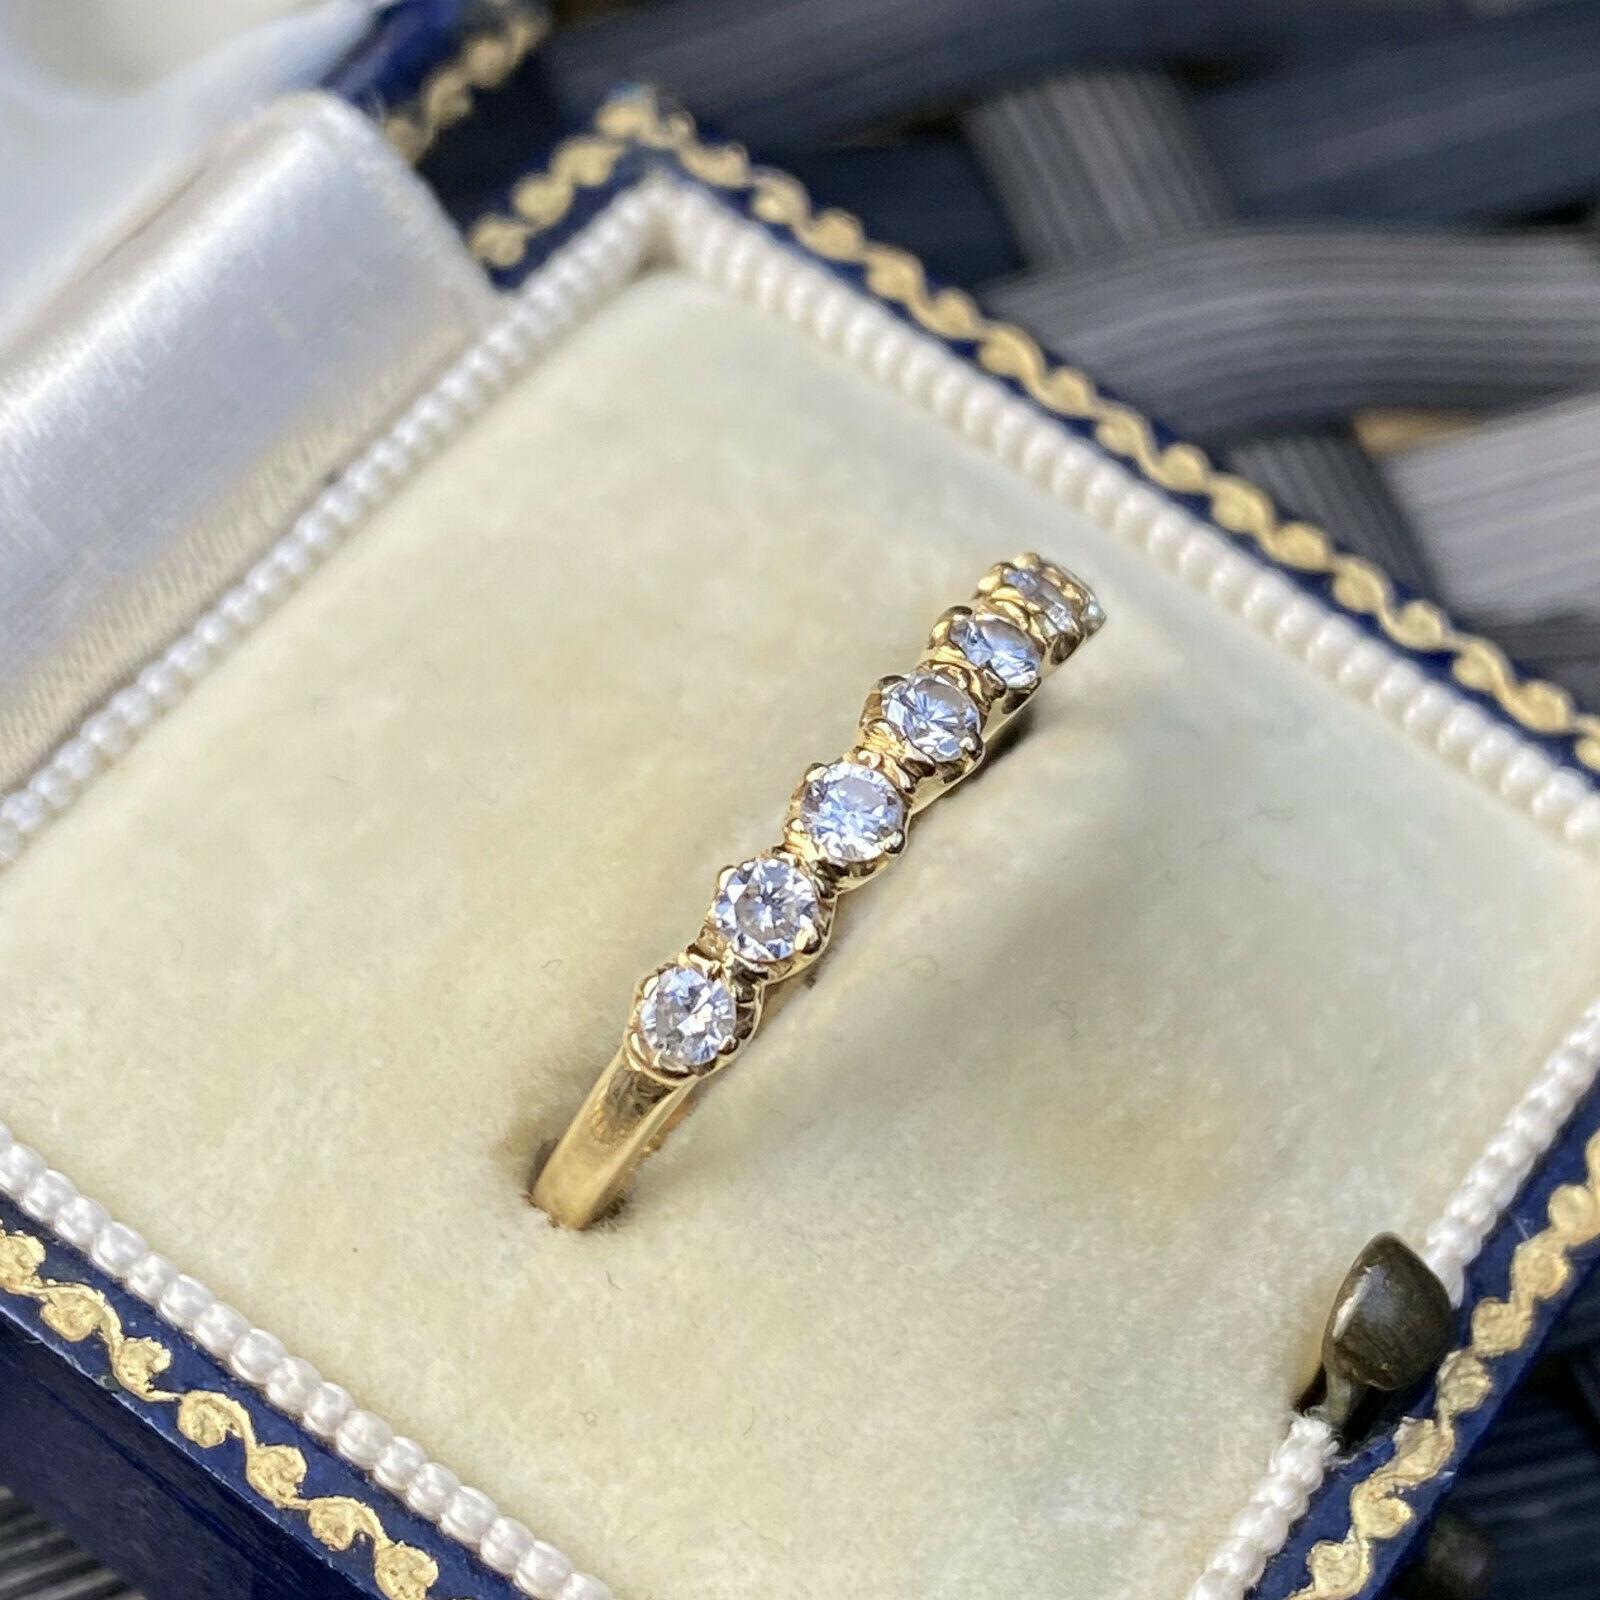 Vintage, 18ct, 18k, 750 Gold Diamond 0.42ct seven stone, eternity, stacker ring